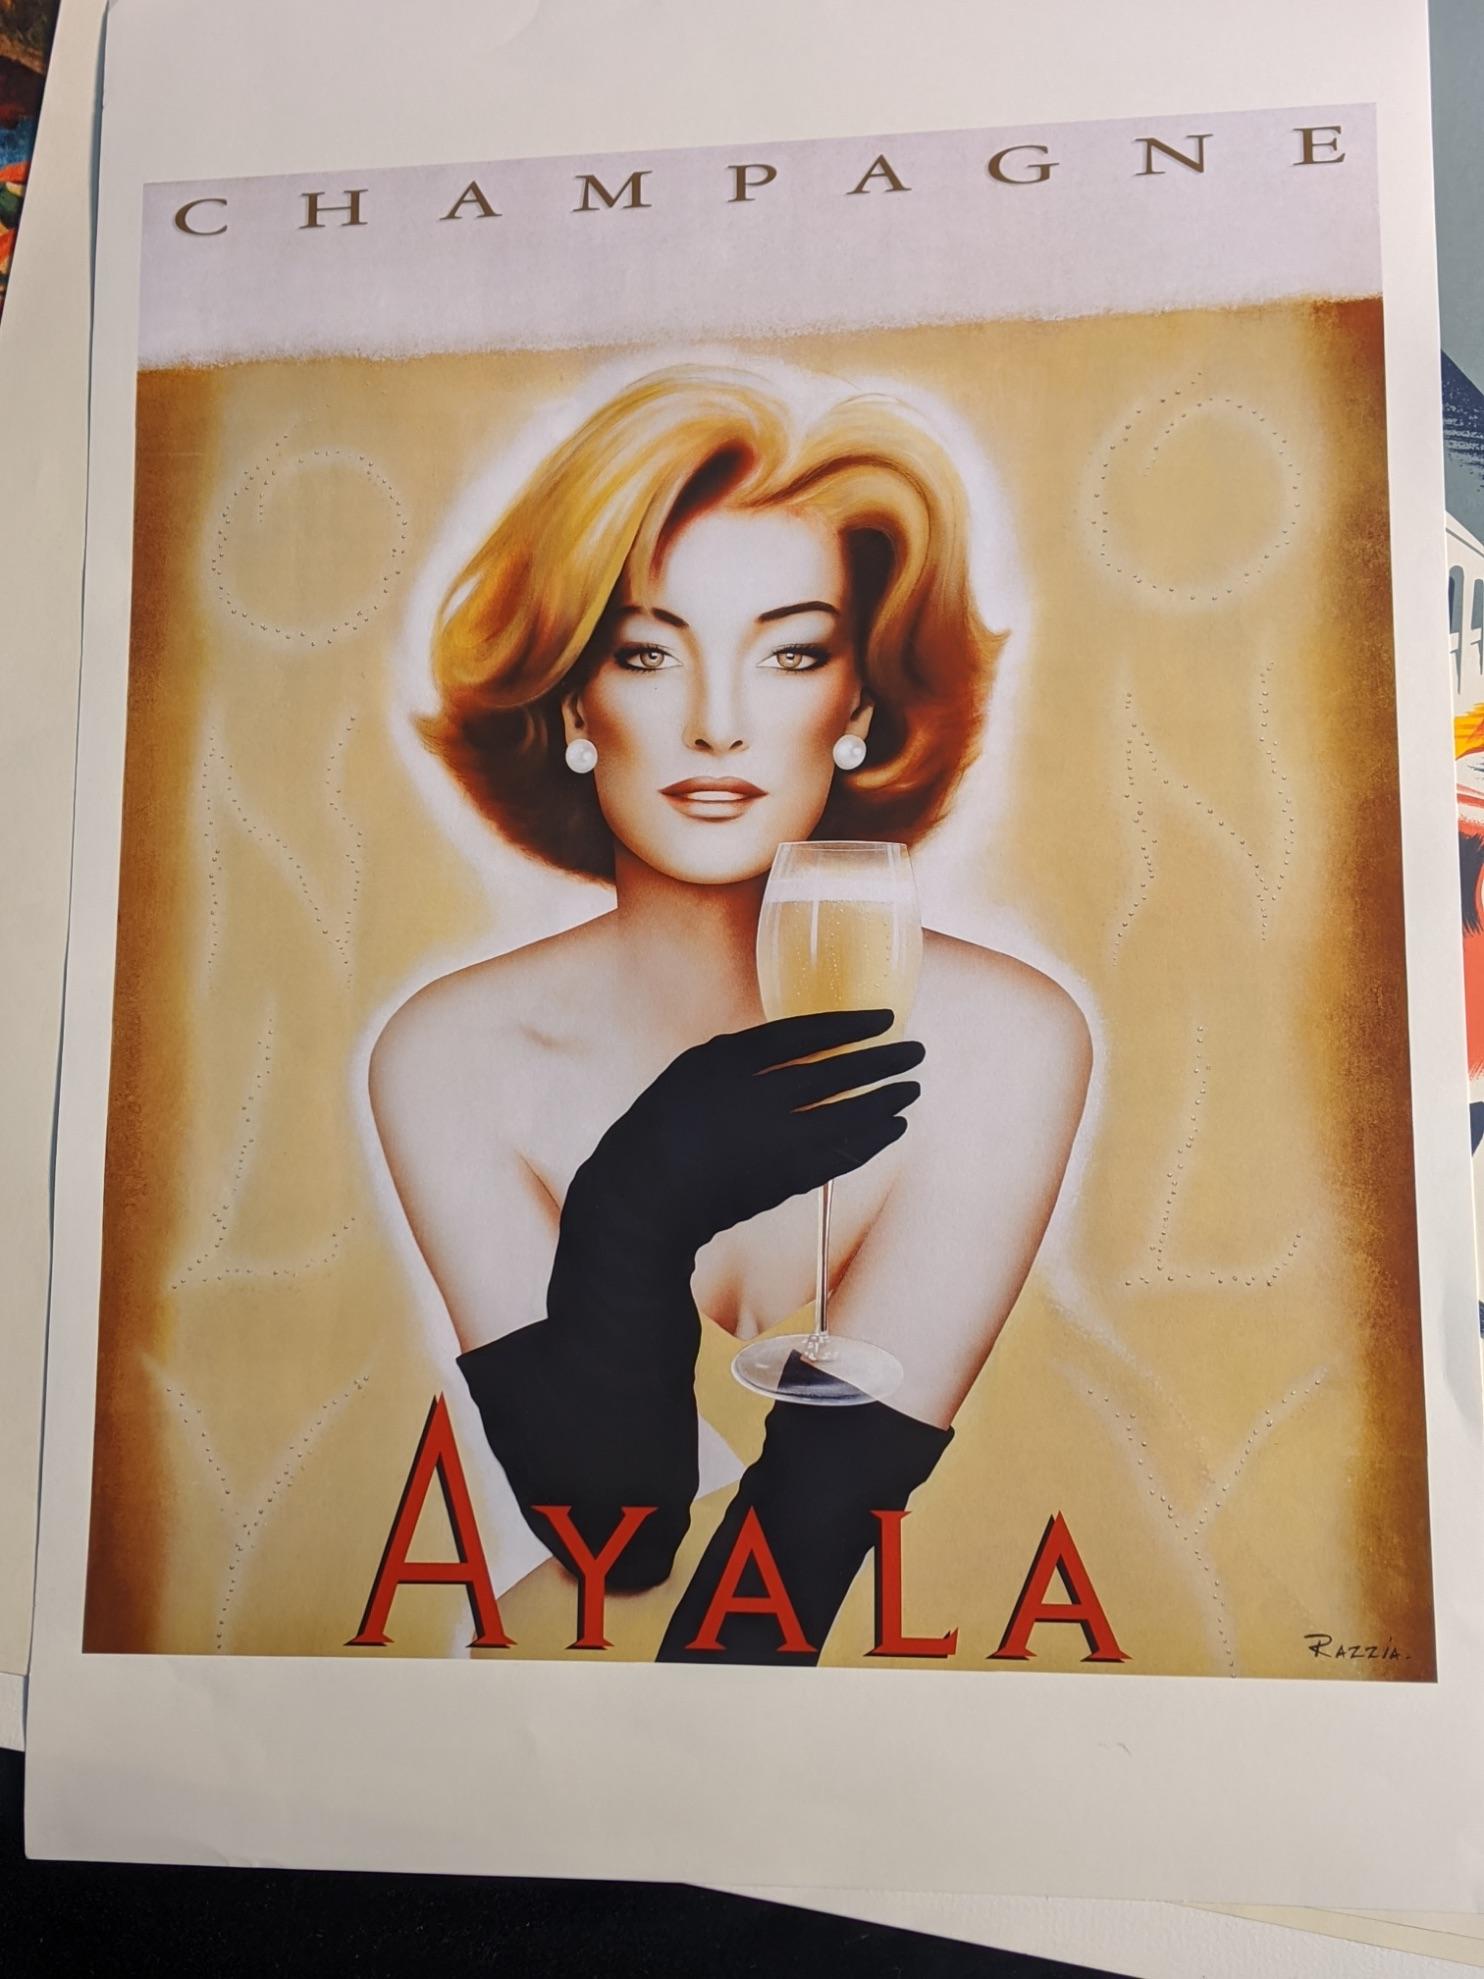 Ayala champagne poster 70cm x 50cm - Image 2 of 2